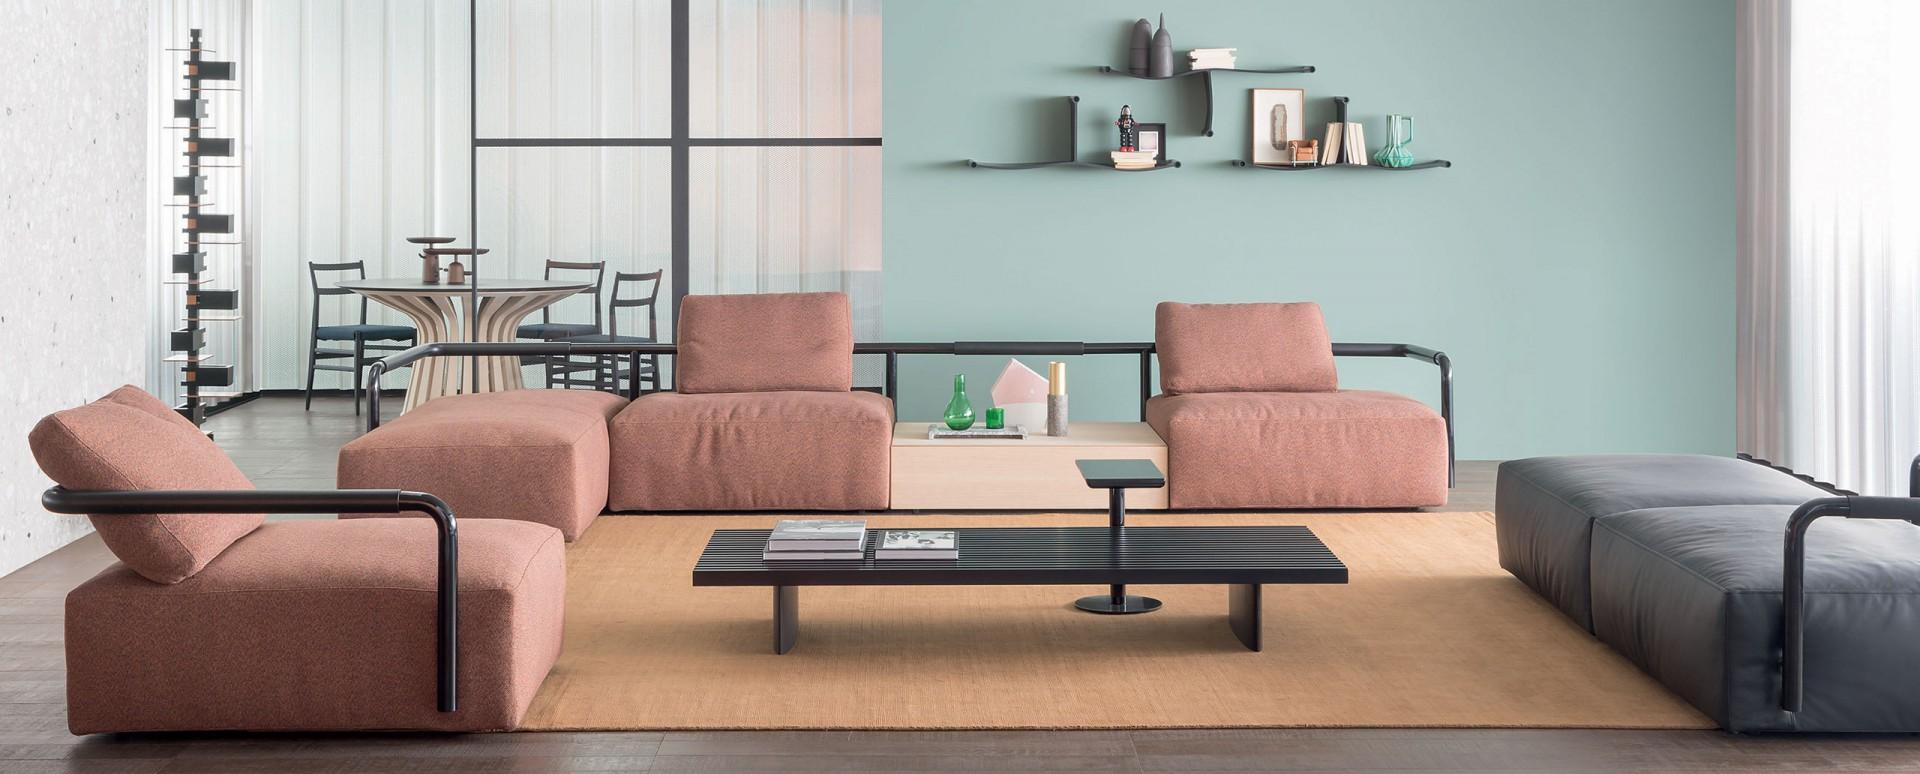 Sofa Soft Props firmy Cassina. Projekt: Konstantin Grcic. Fot. Cassina